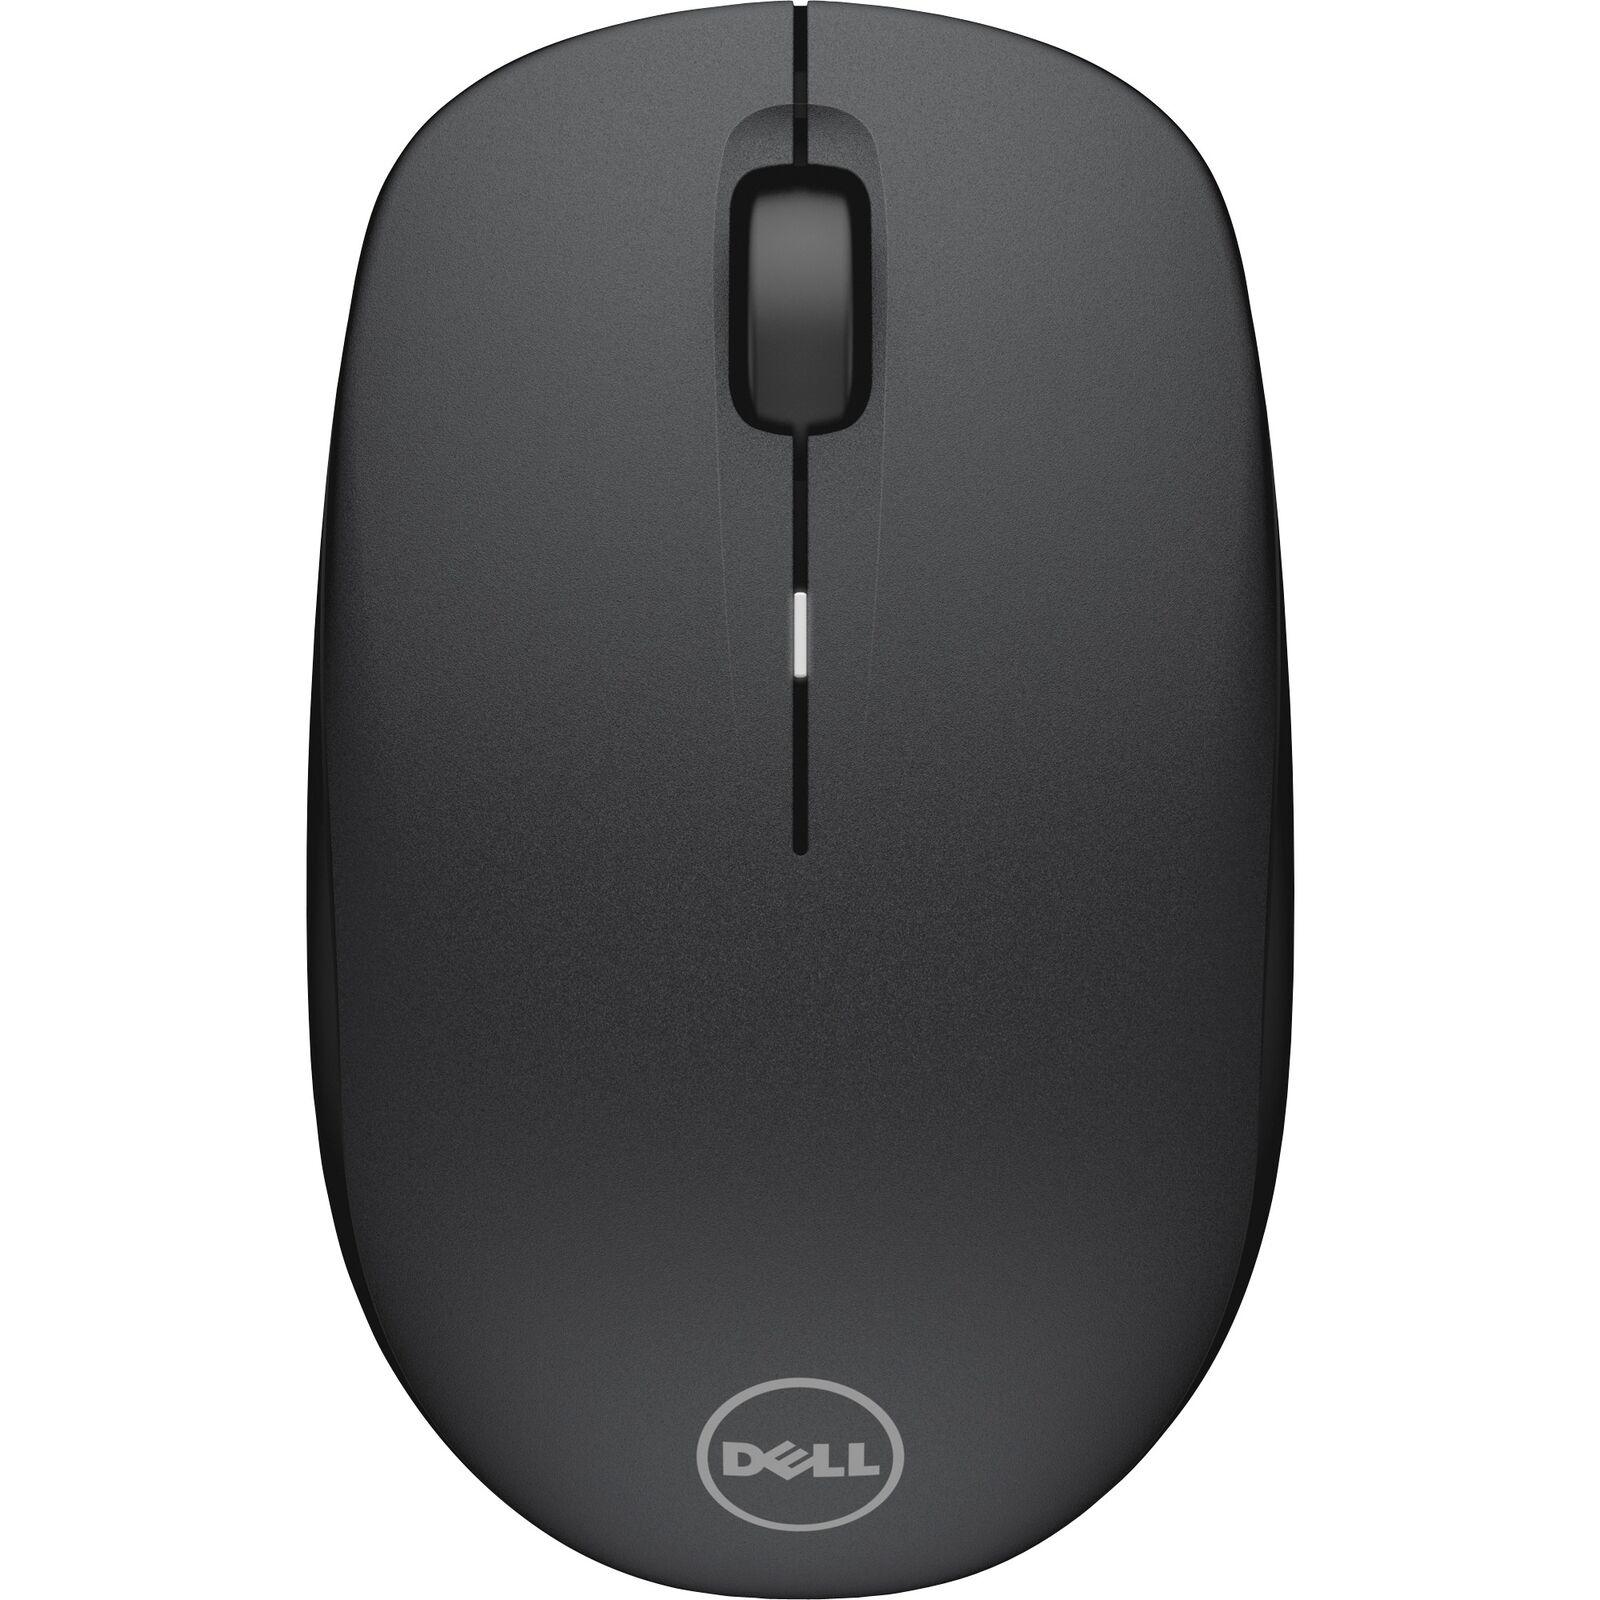 Dell Maus - Modell: WM126